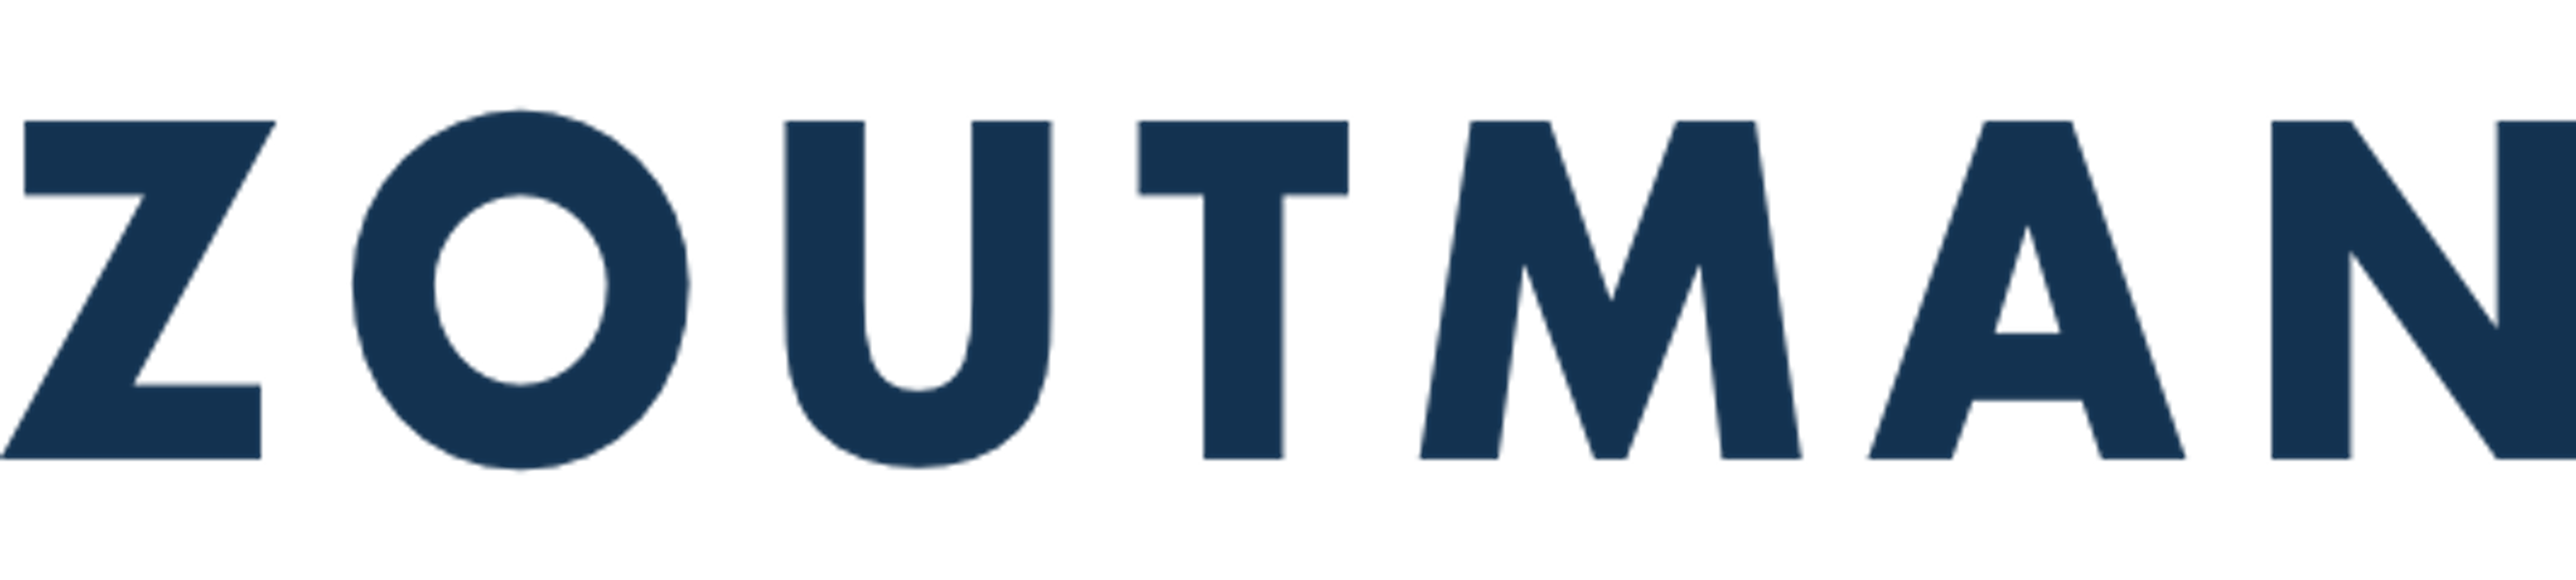 ZOUTMAN logo